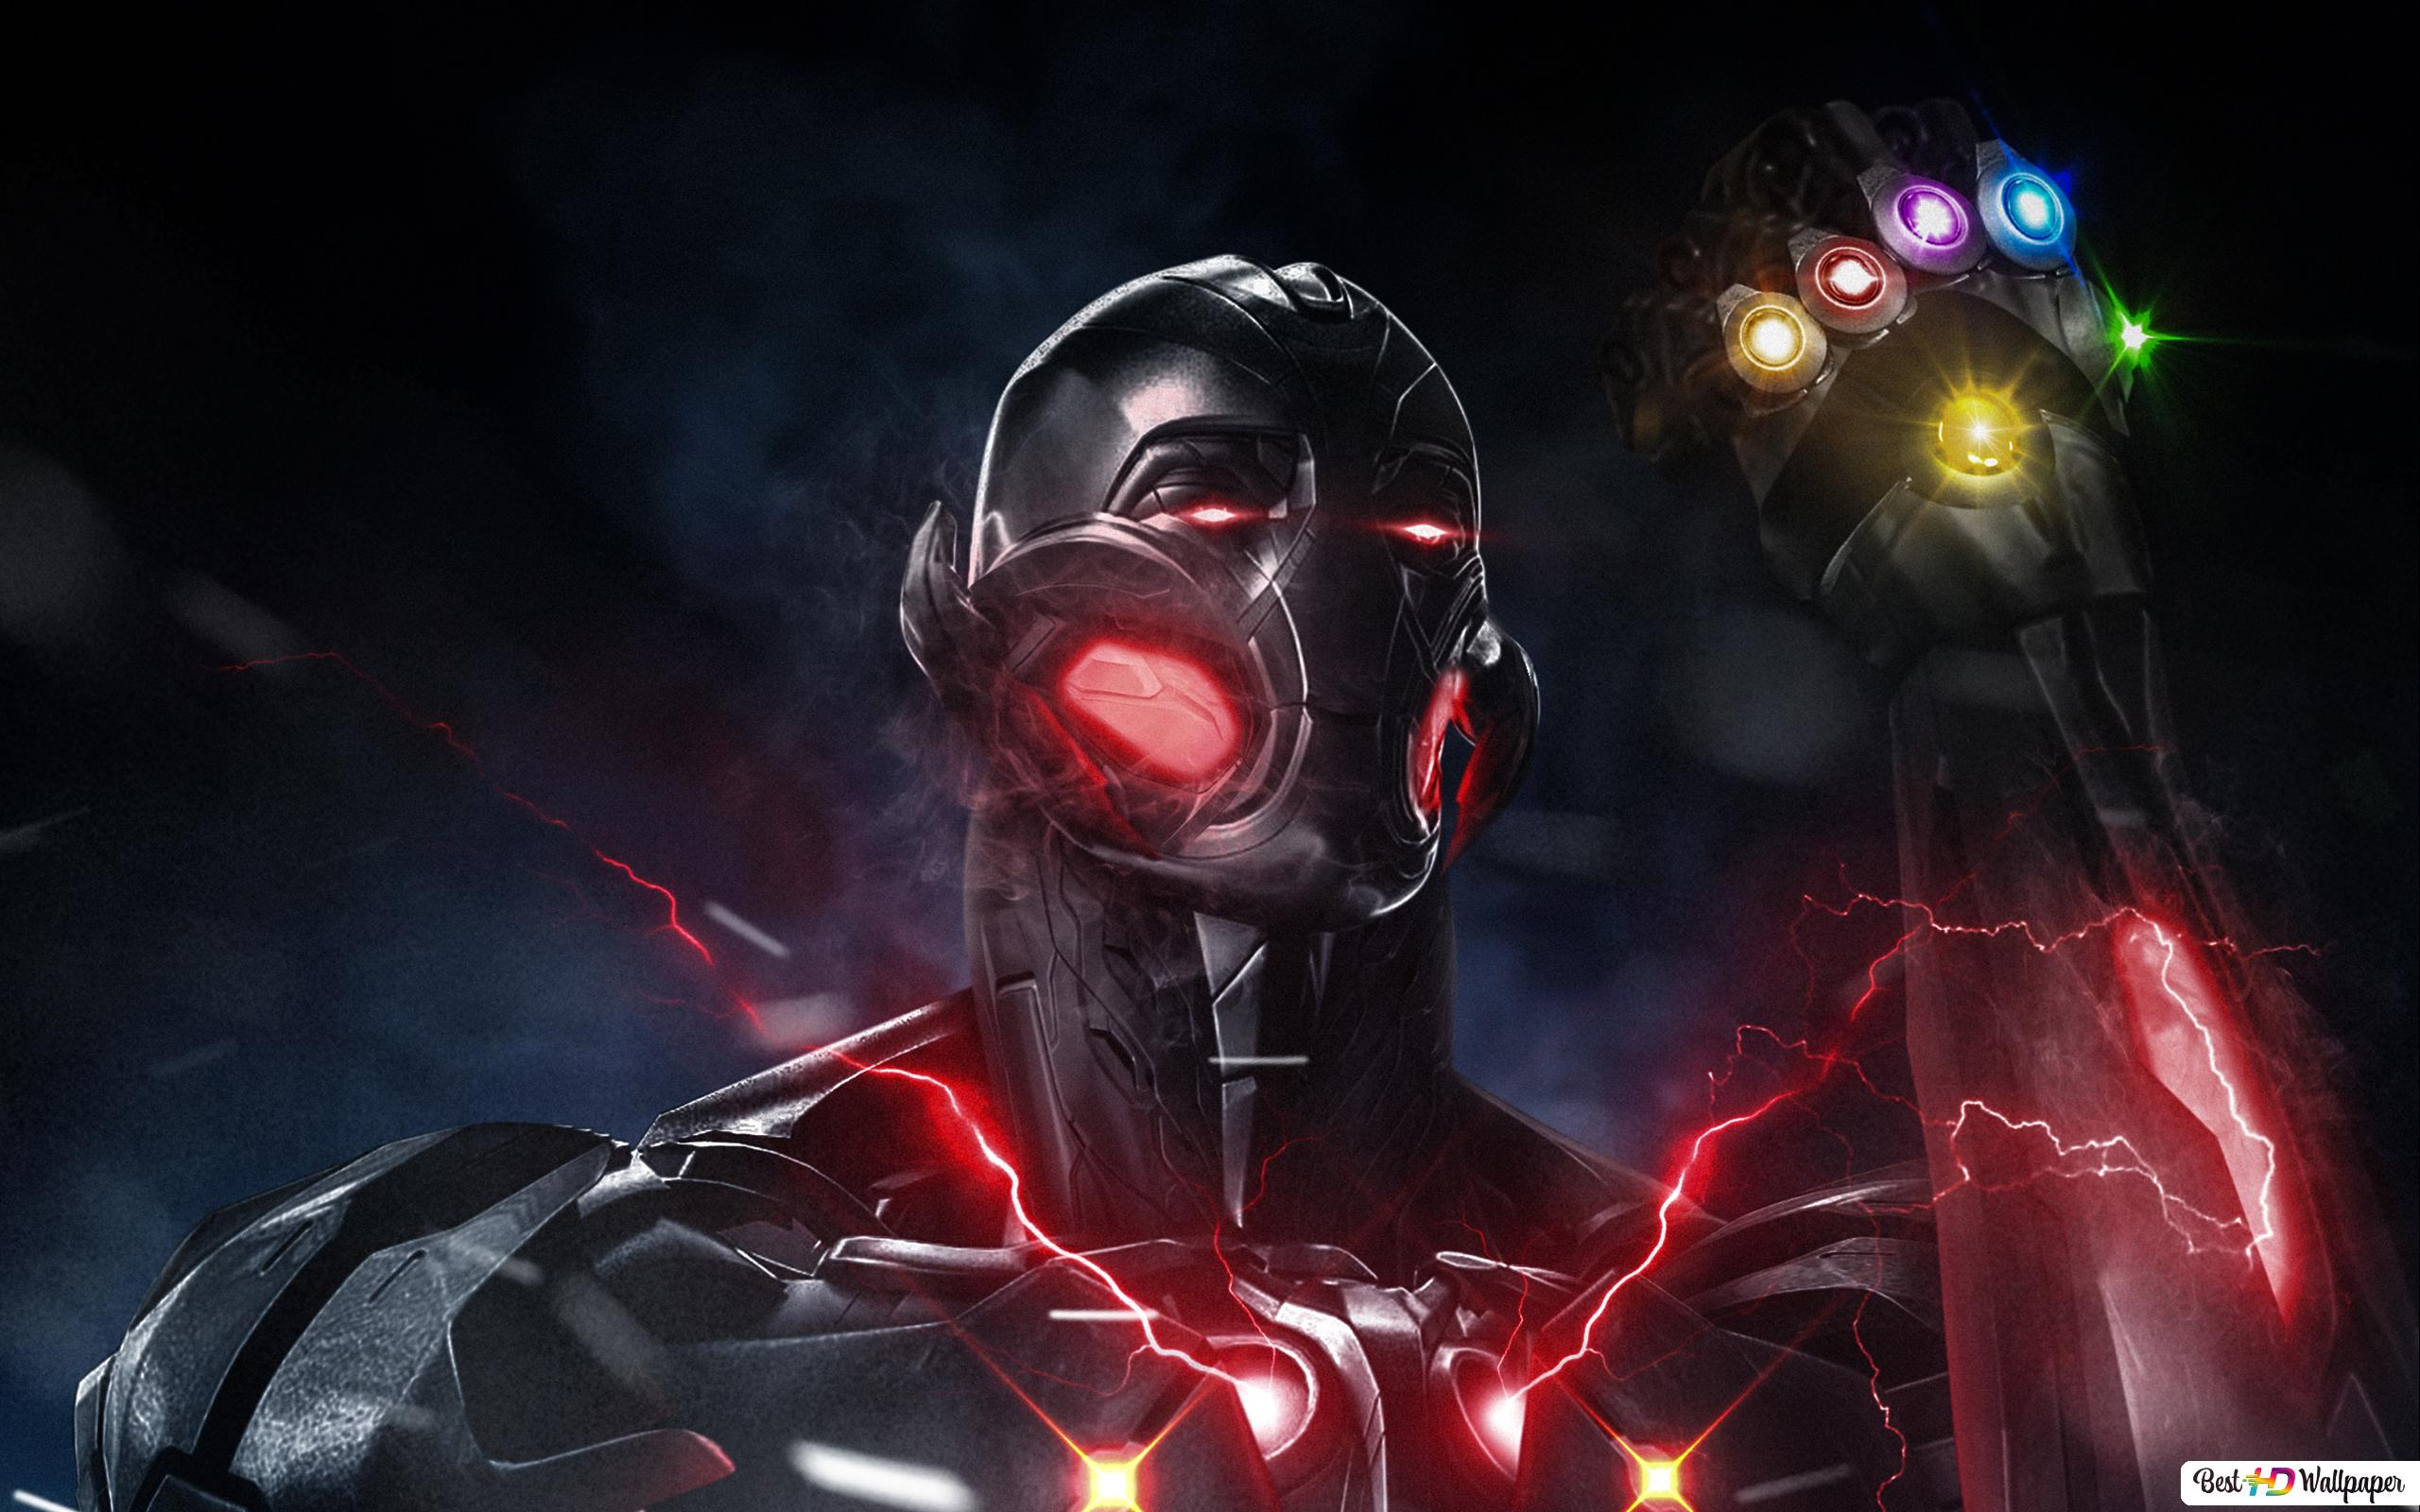 Avengers Endgame Ultron With Infinity Gauntlet Hd Wallpaper